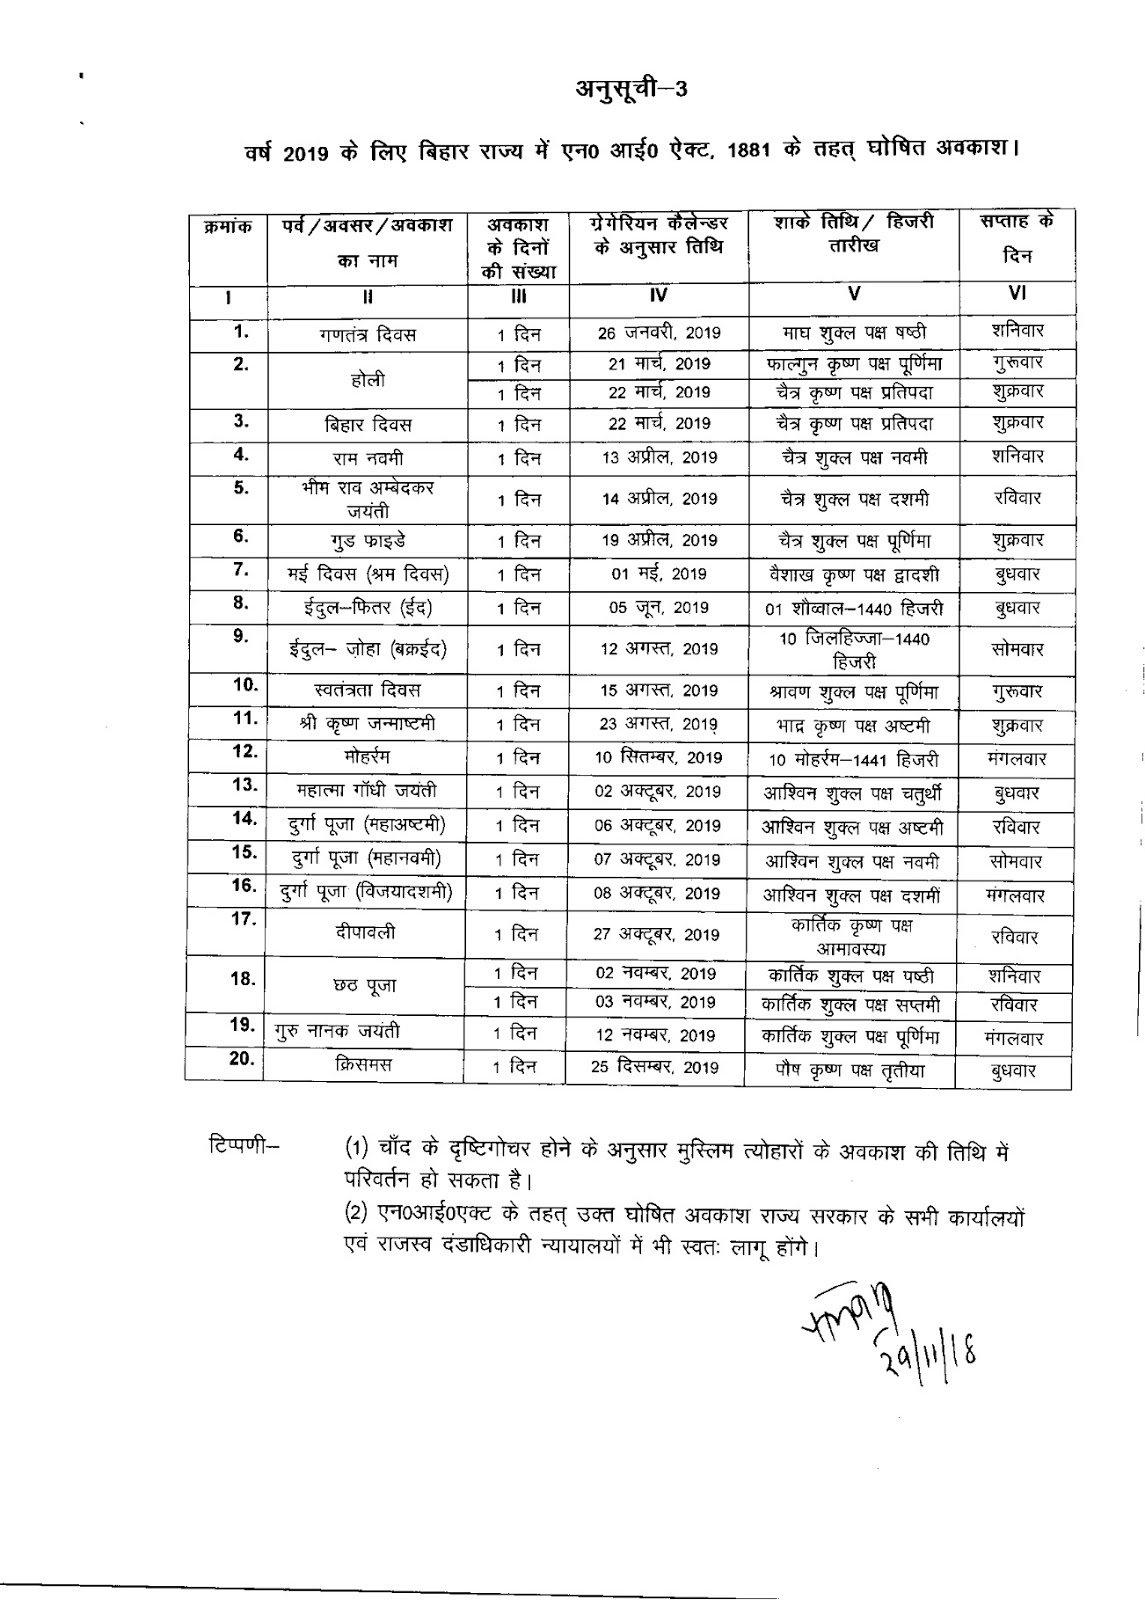 Bihar Government Calendar 2019 #educratsweb Calendar 2019 Government